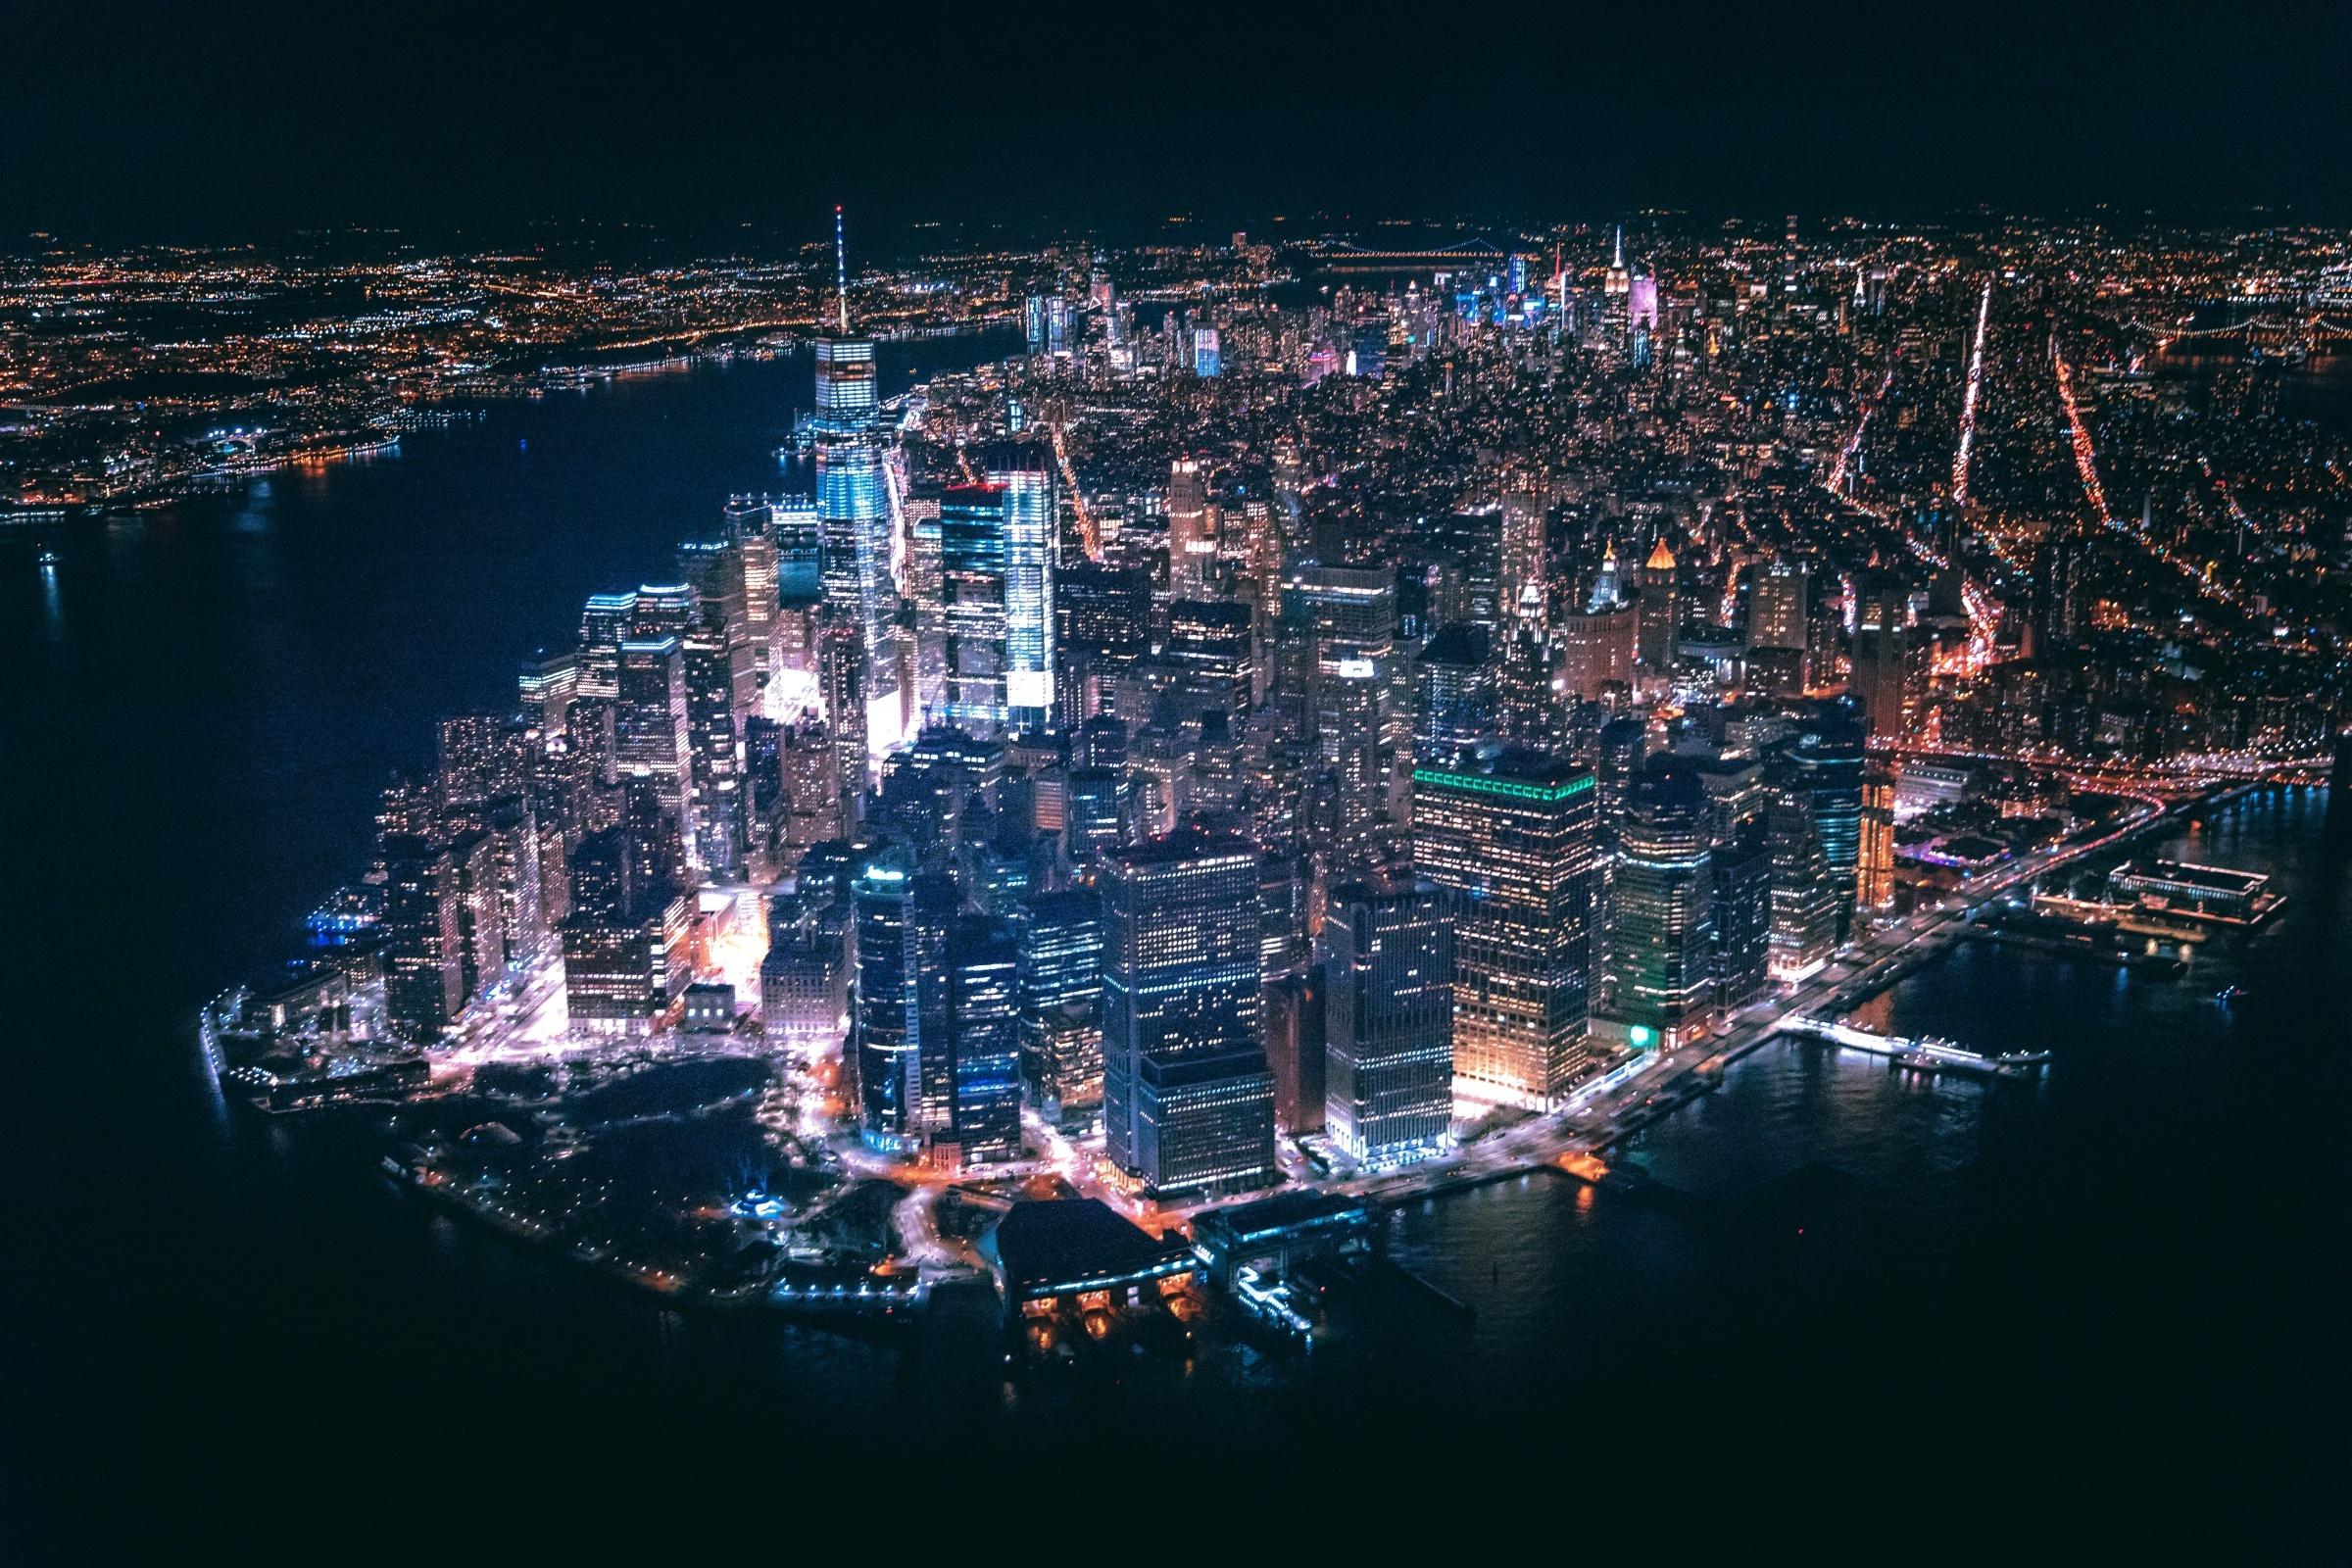 New York City, Aerial View, At Night, YSG Solar